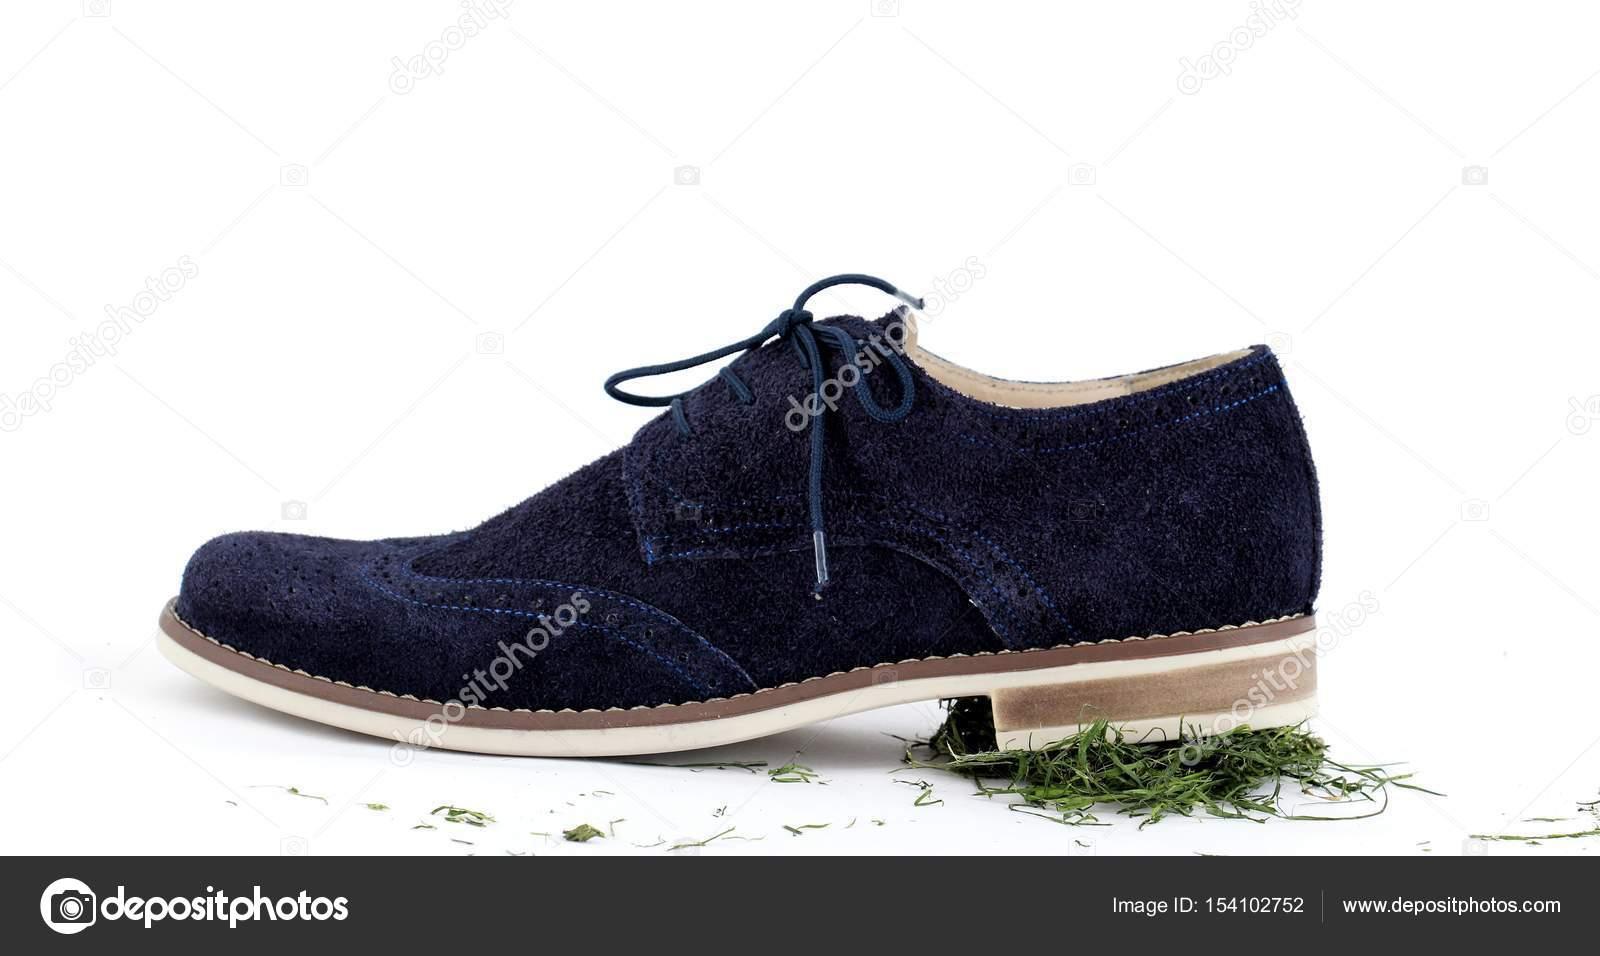 6529dfd2b535c9 scarpe maschili su sfondo bianco — Foto Stock © nehruresen #154102752